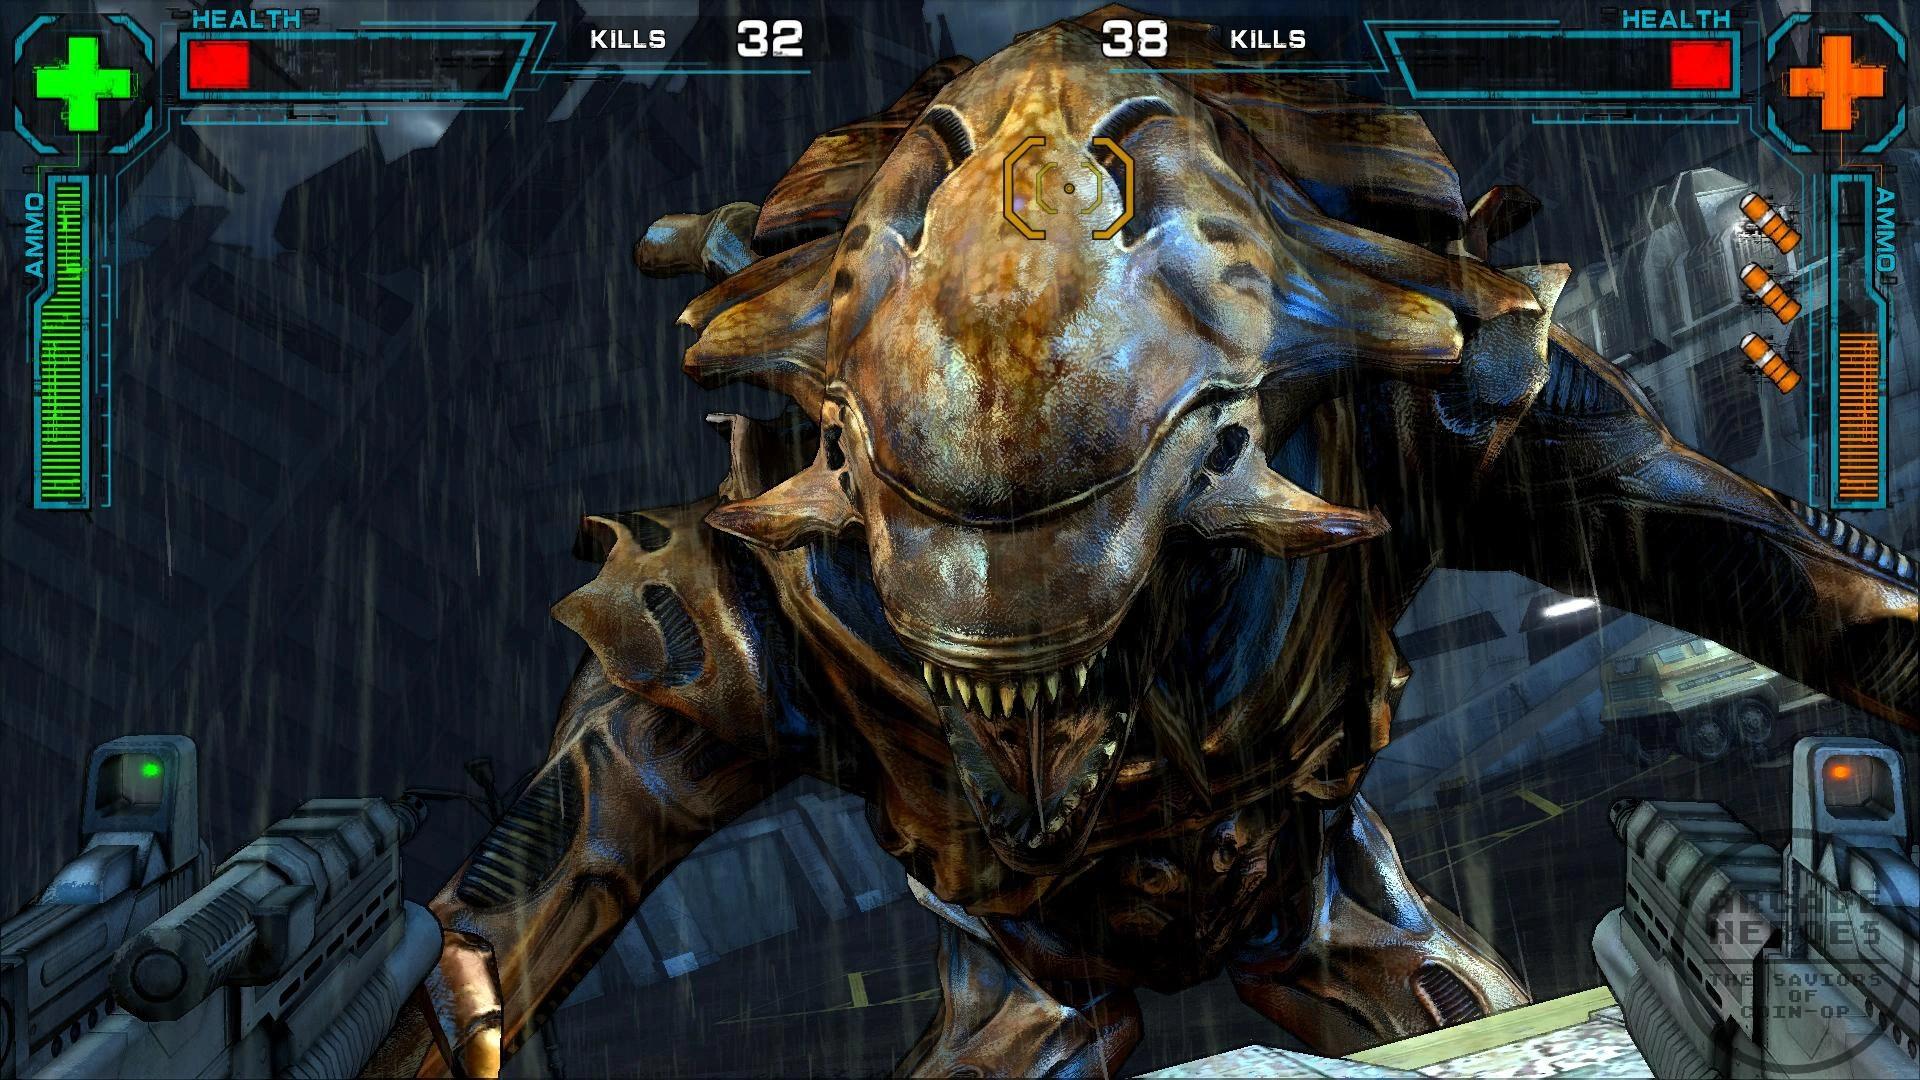 Halo Reach 3d Wallpaper Pc Aliens Armageddon Xenopedia Fandom Powered By Wikia